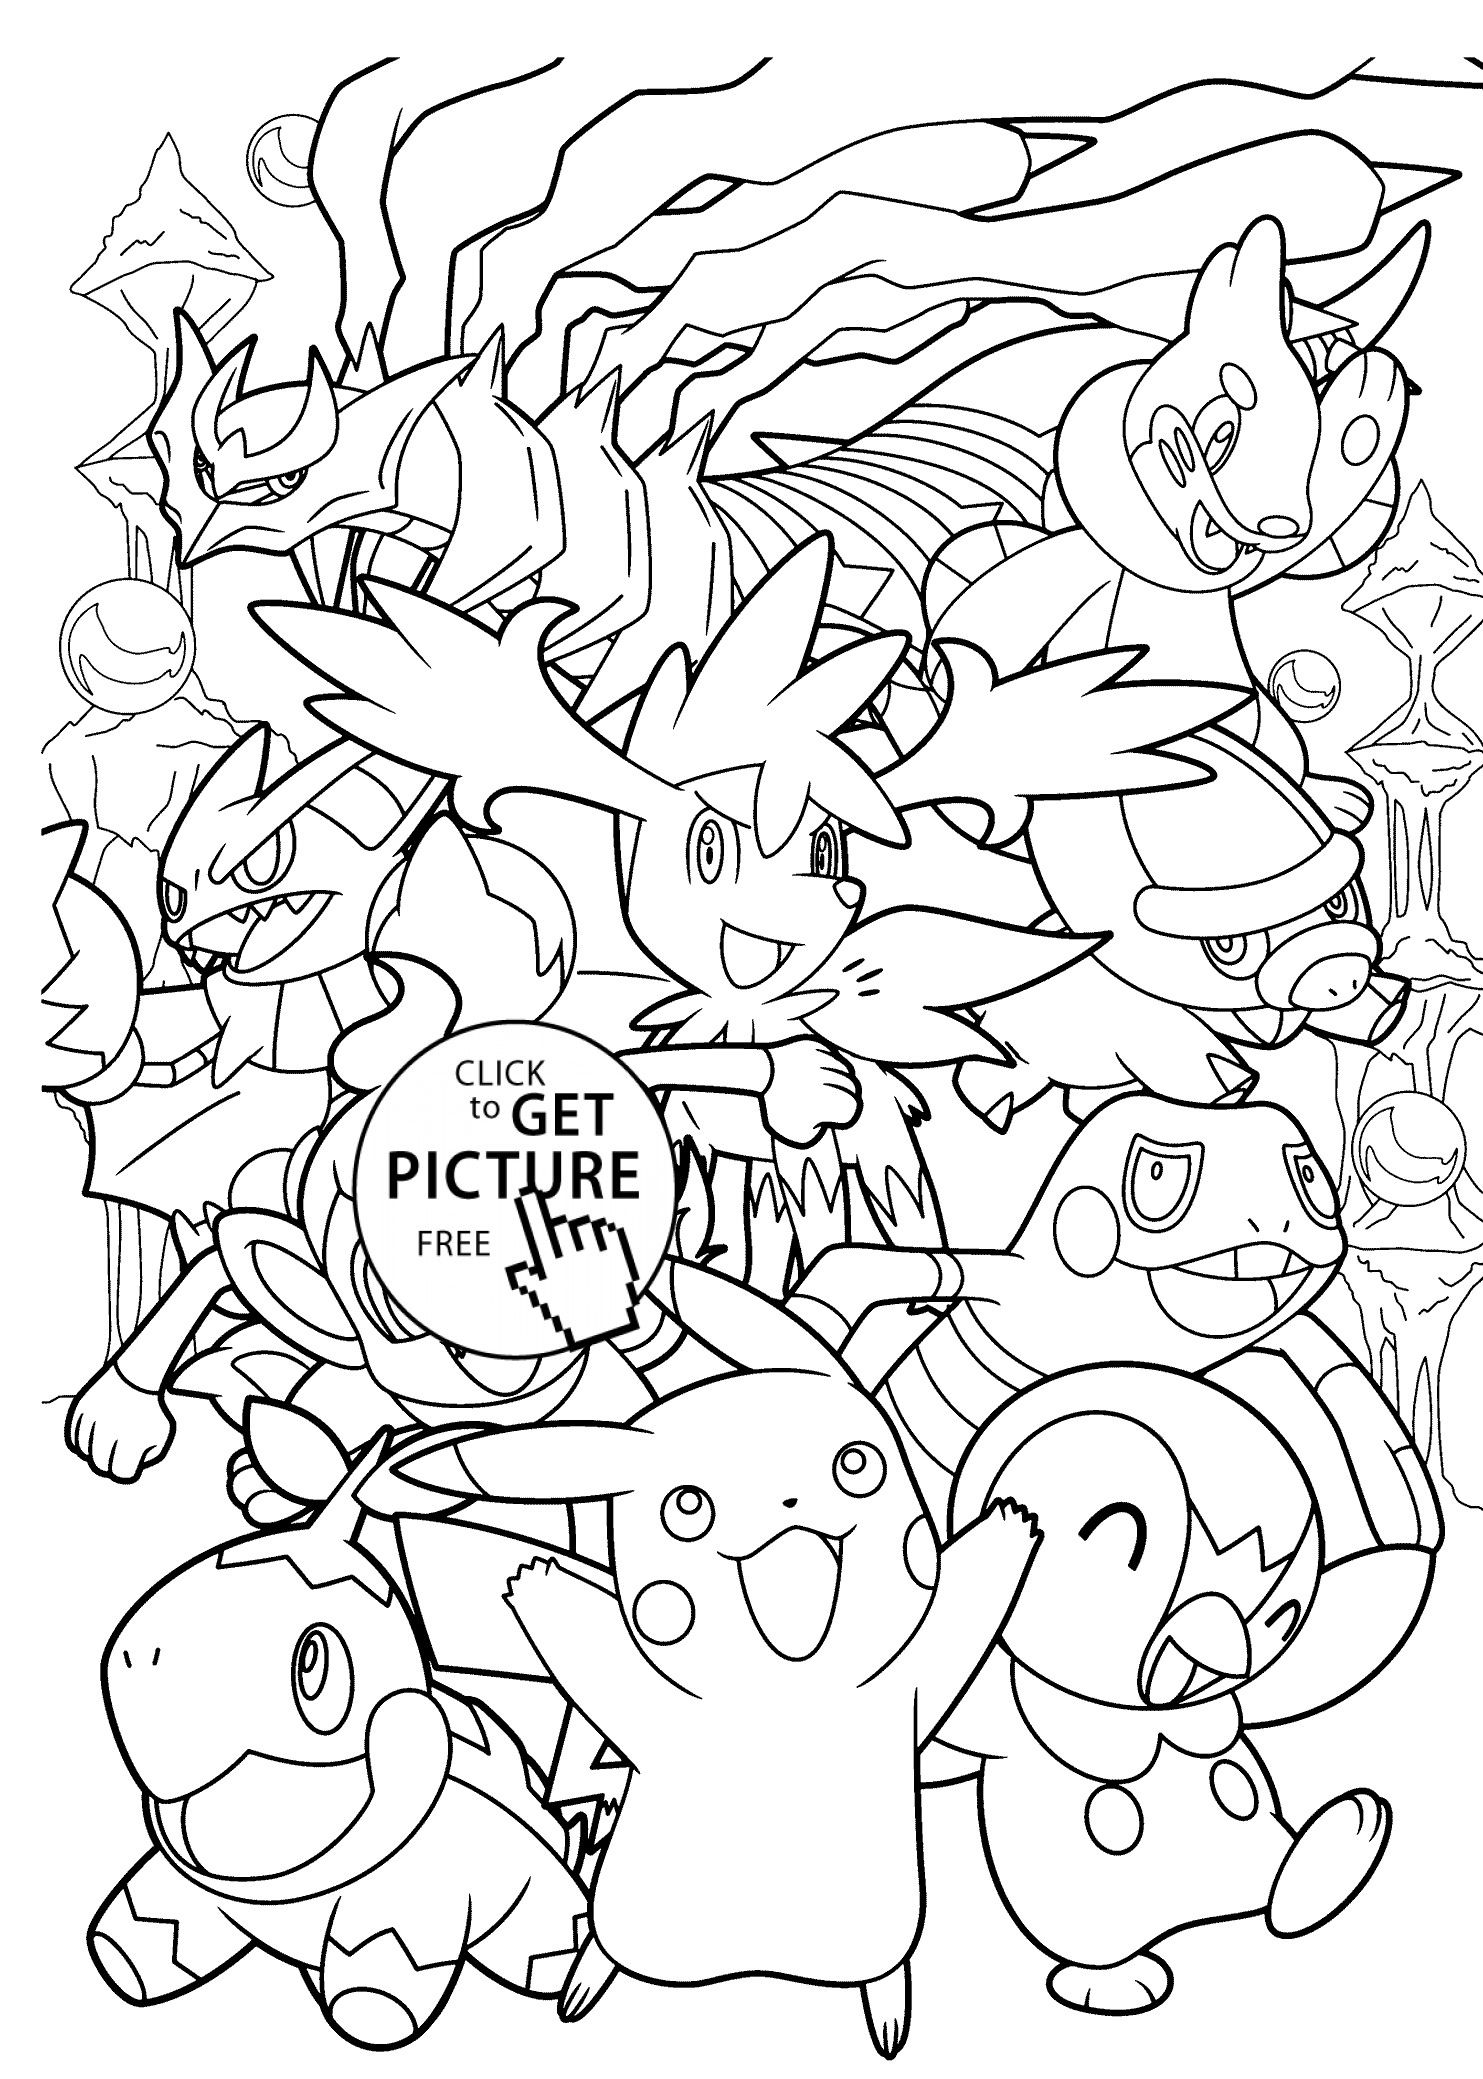 Pokemon Ball Coloring Page Fresh Pokemon Ball Coloring Page Arenda Stroy Pokemon Coloring Pages Pokemon Coloring Pikachu Coloring Page